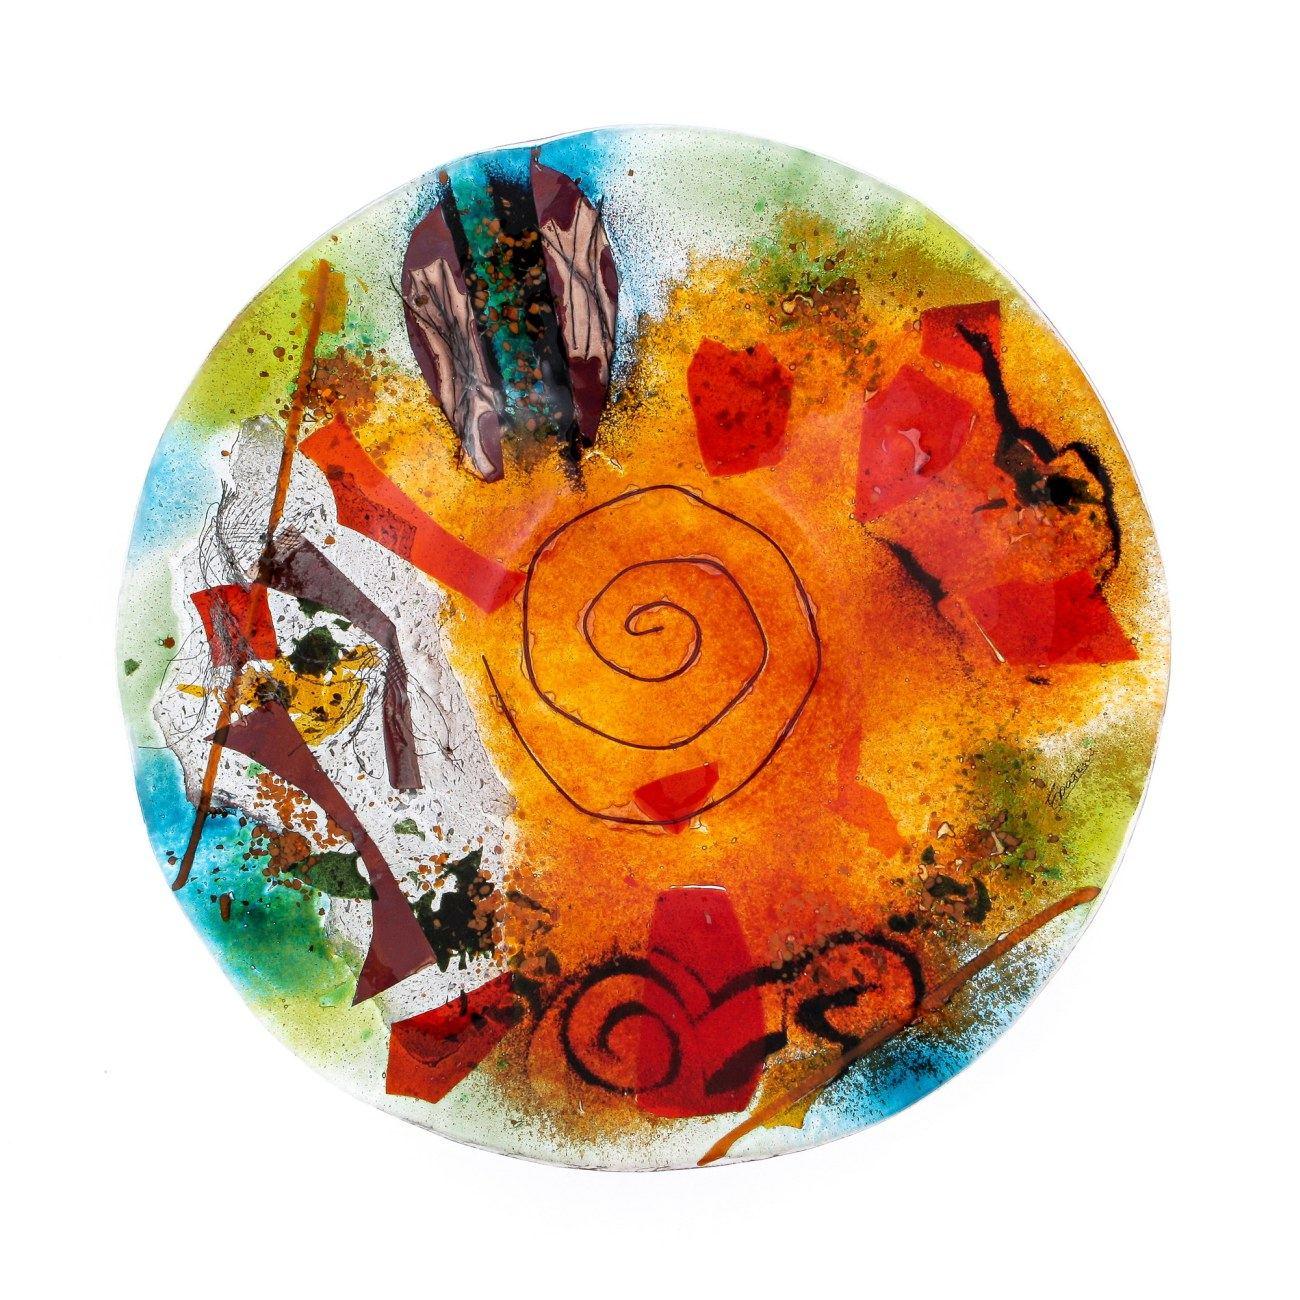 Decorative Round Platter Handmade Fused Glass Centerpiece Orange Green Design 35cm 13 8